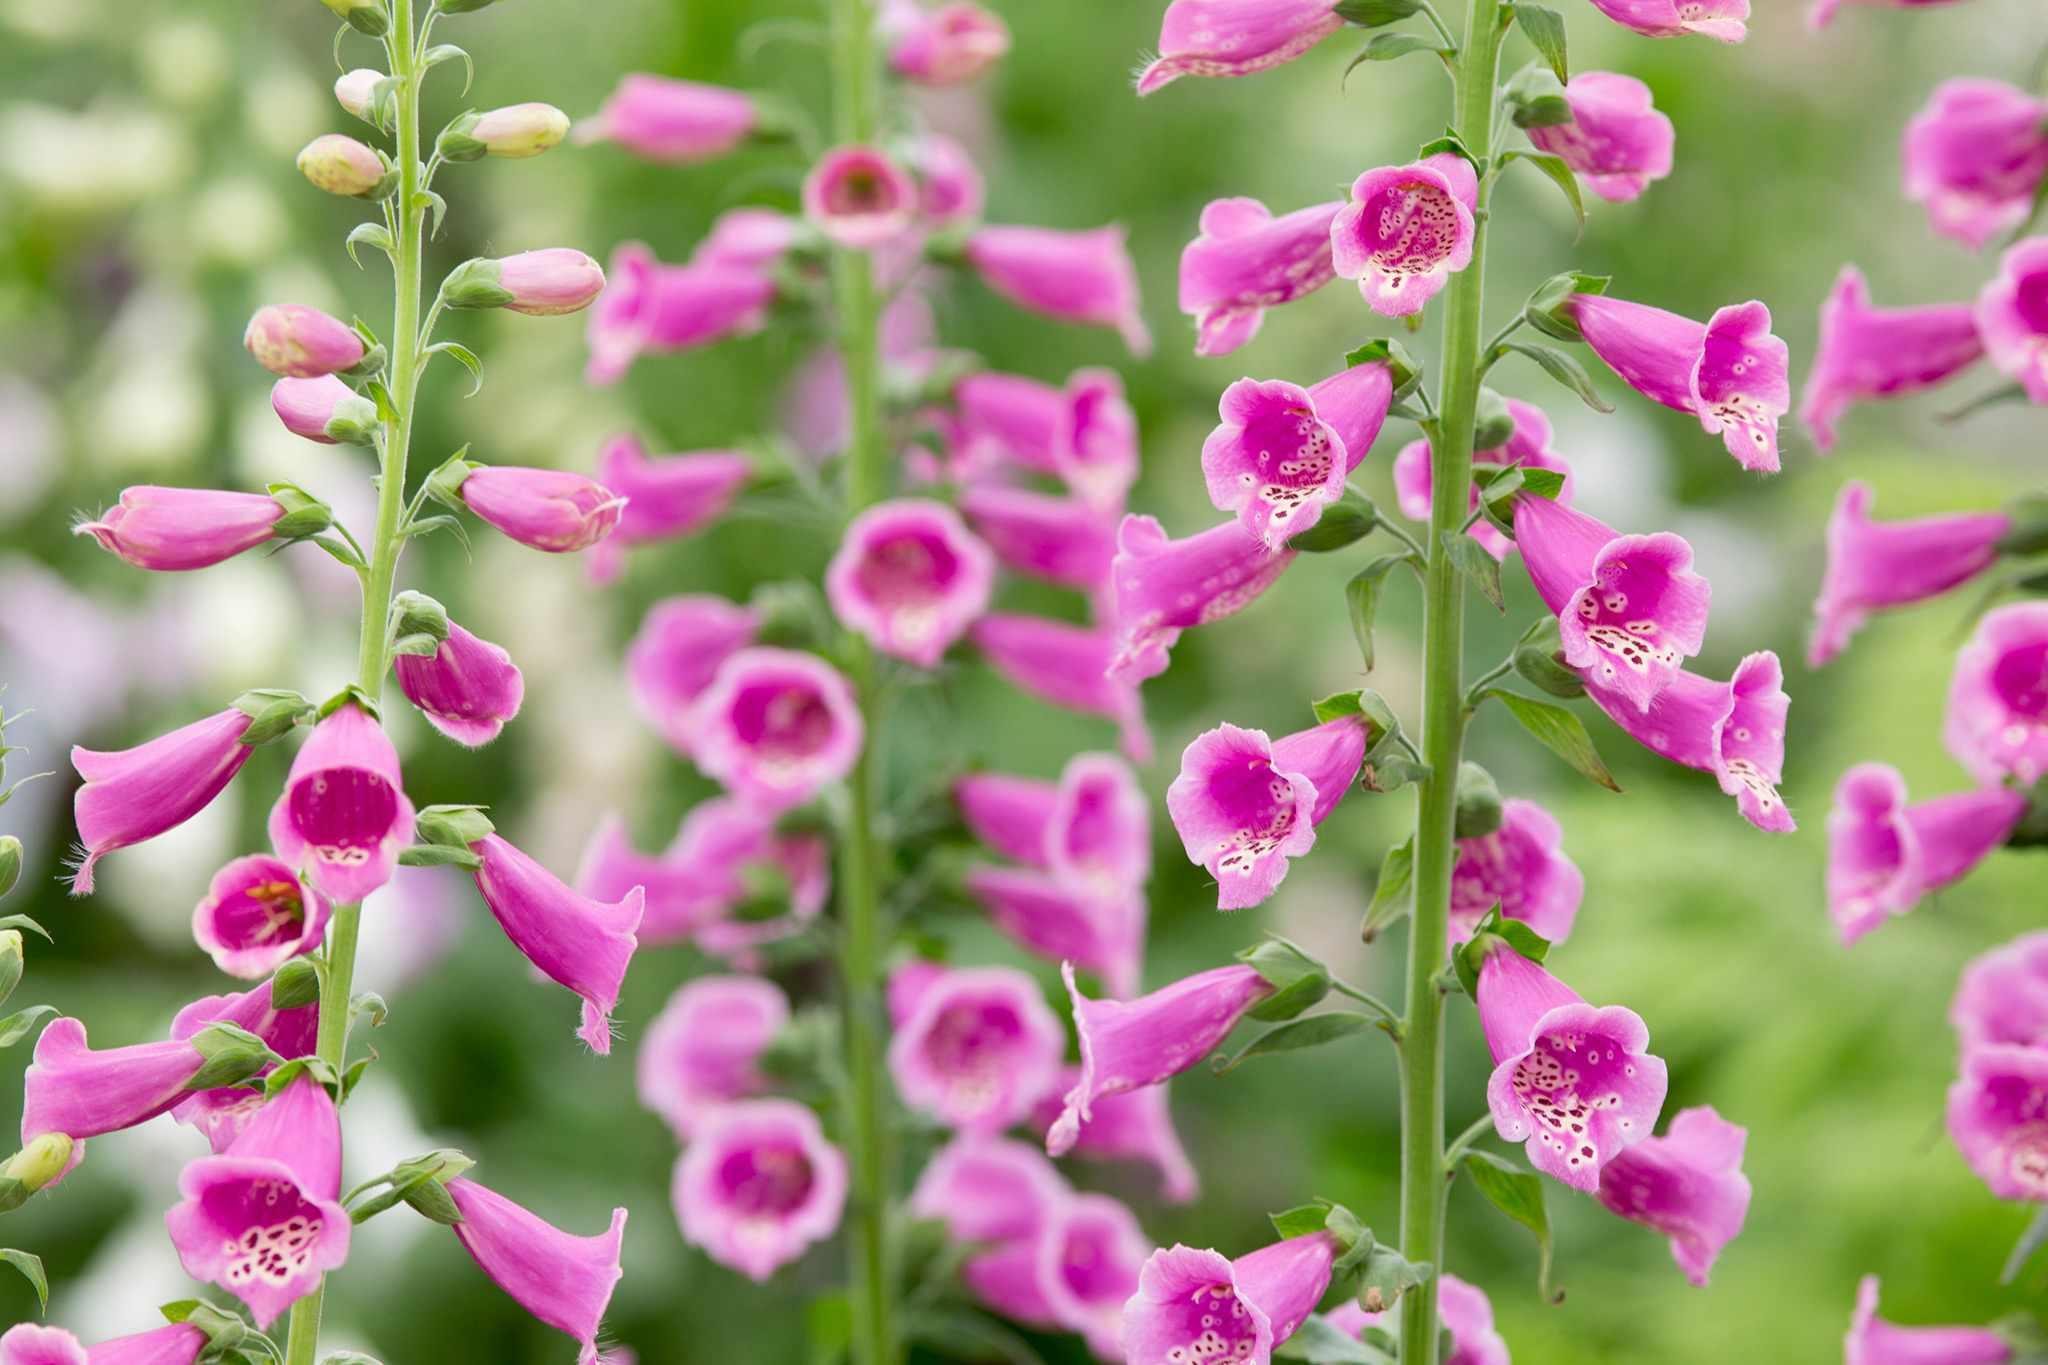 Pink-purple flowers of foxglove 'Dalmatian Purple'